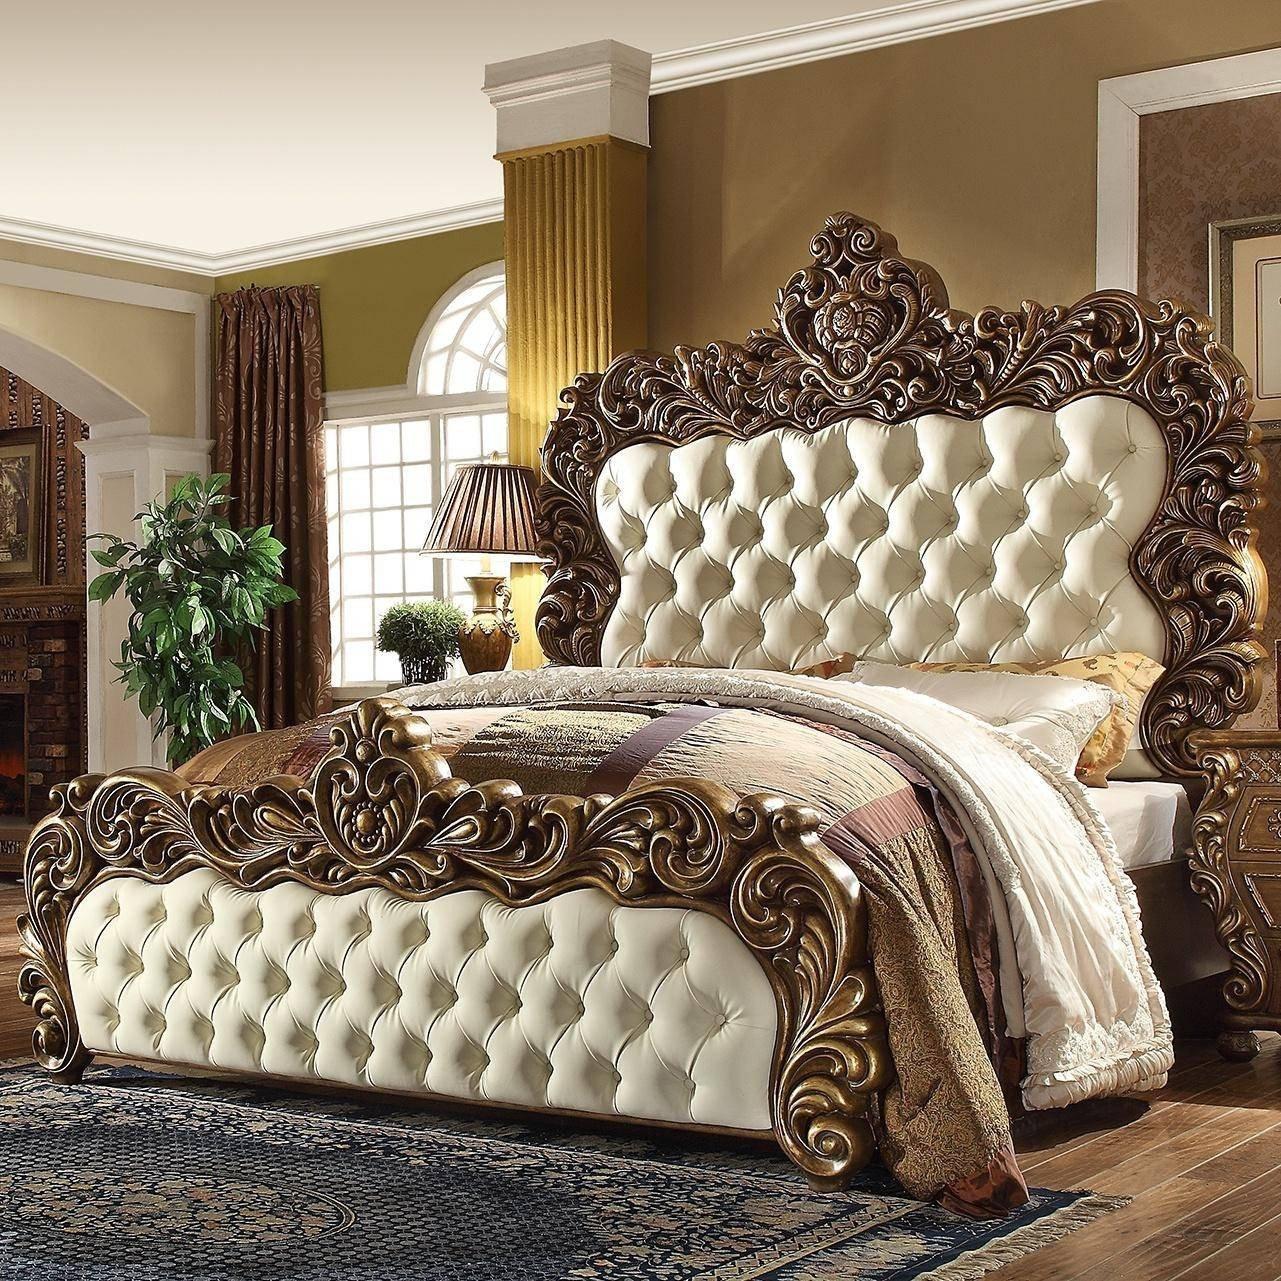 California King Bedroom Set New Rich Walnut Golden Finish Cal King Bedroom Set 5pcs